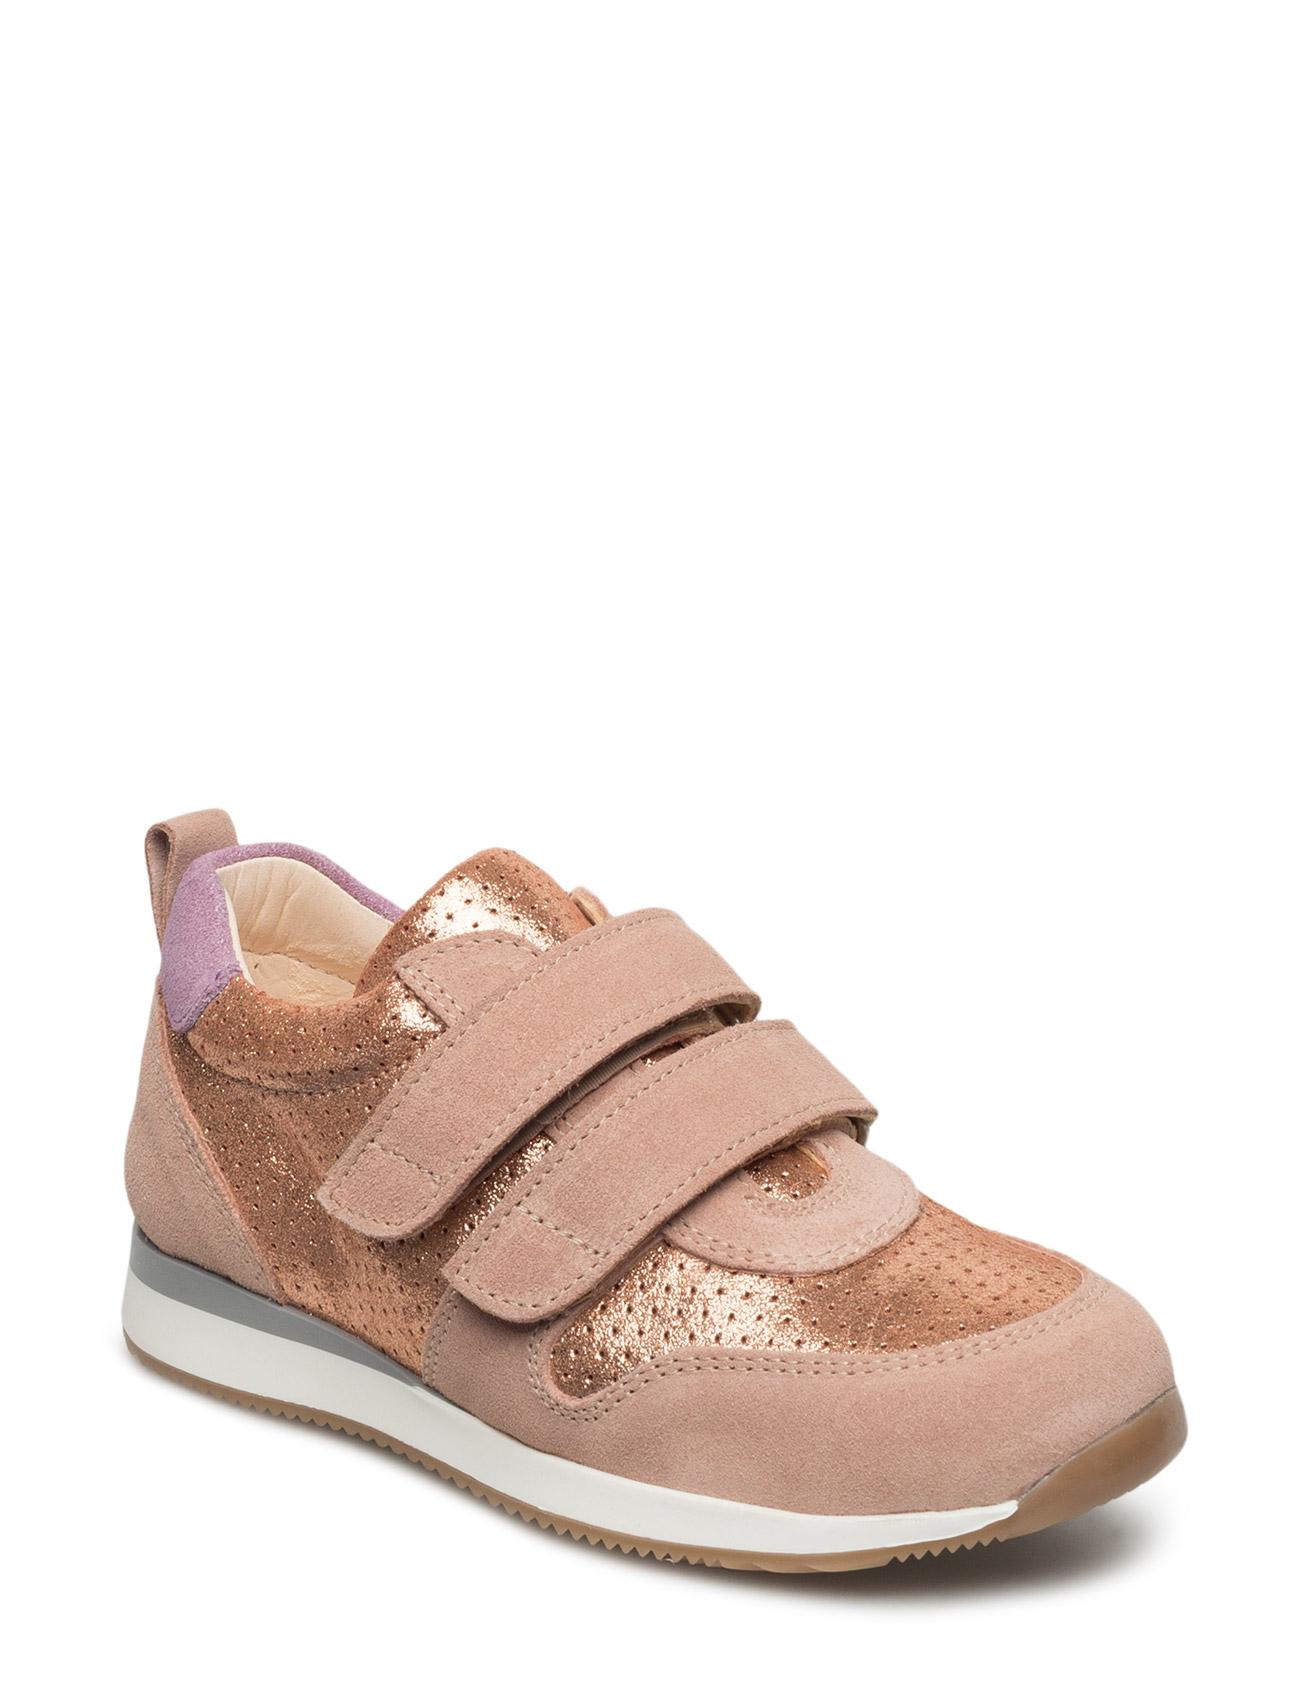 42e000463ab8 Classic Sneakers W. Velcro ANGULUS Sko til Piger i